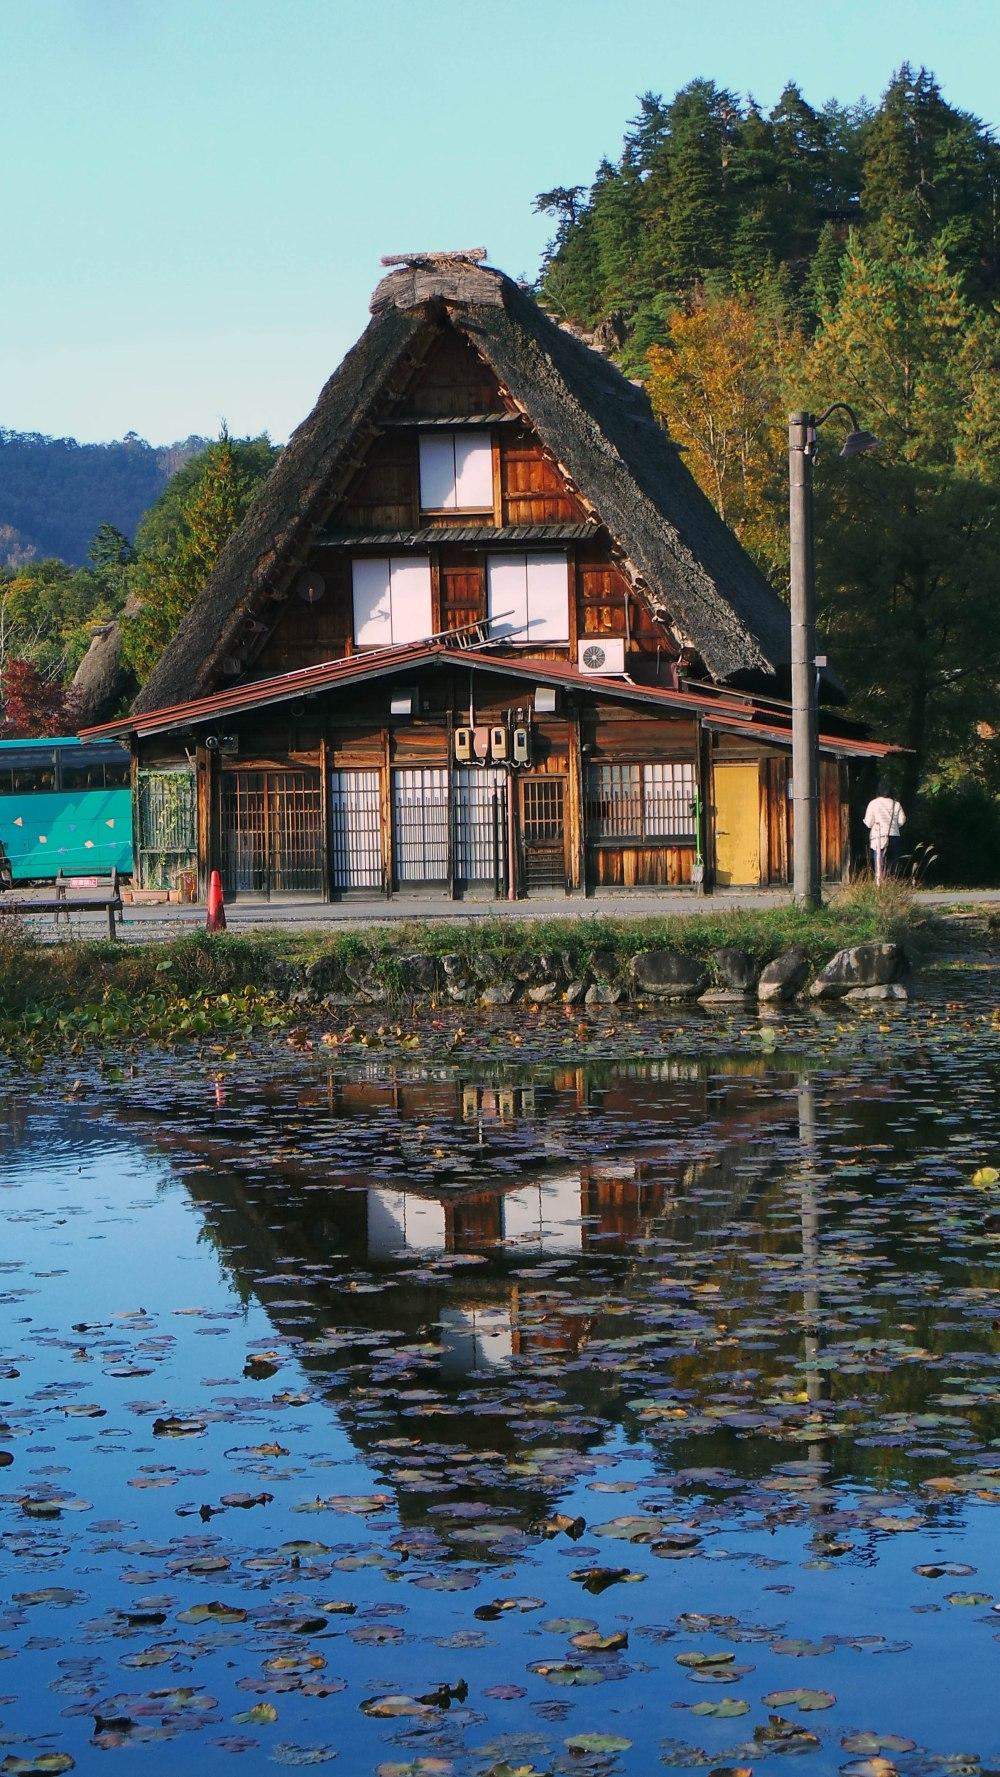 Maison Gasshō-zukuridans le village de Shirakawago, Japon